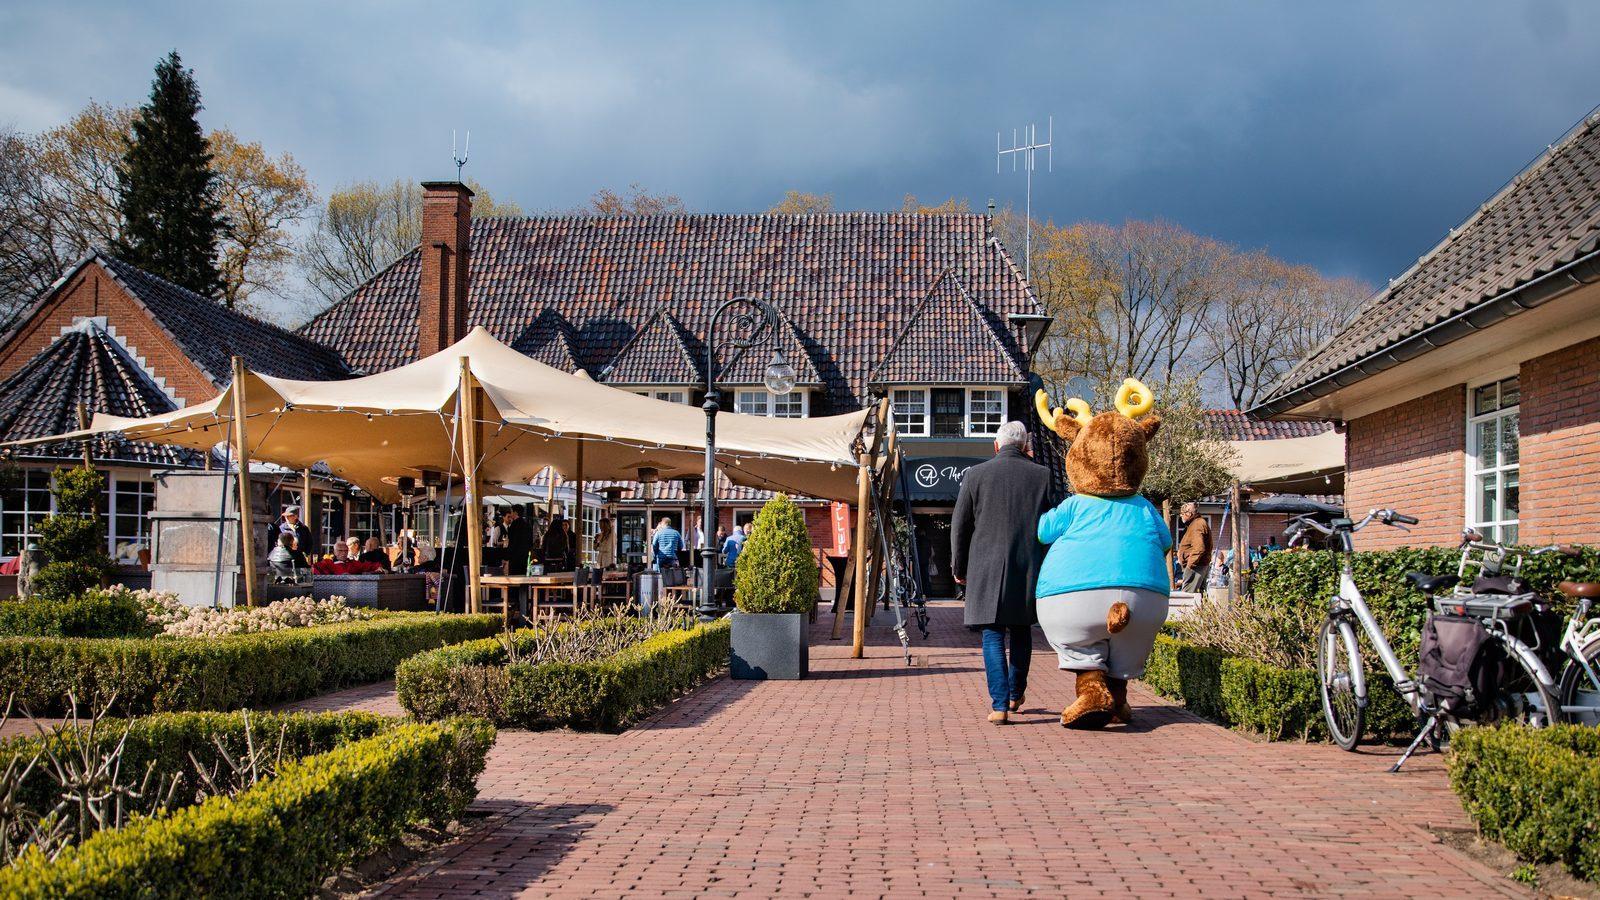 Restaurant @thePark Asia opened at Landgoed de Scheleberg